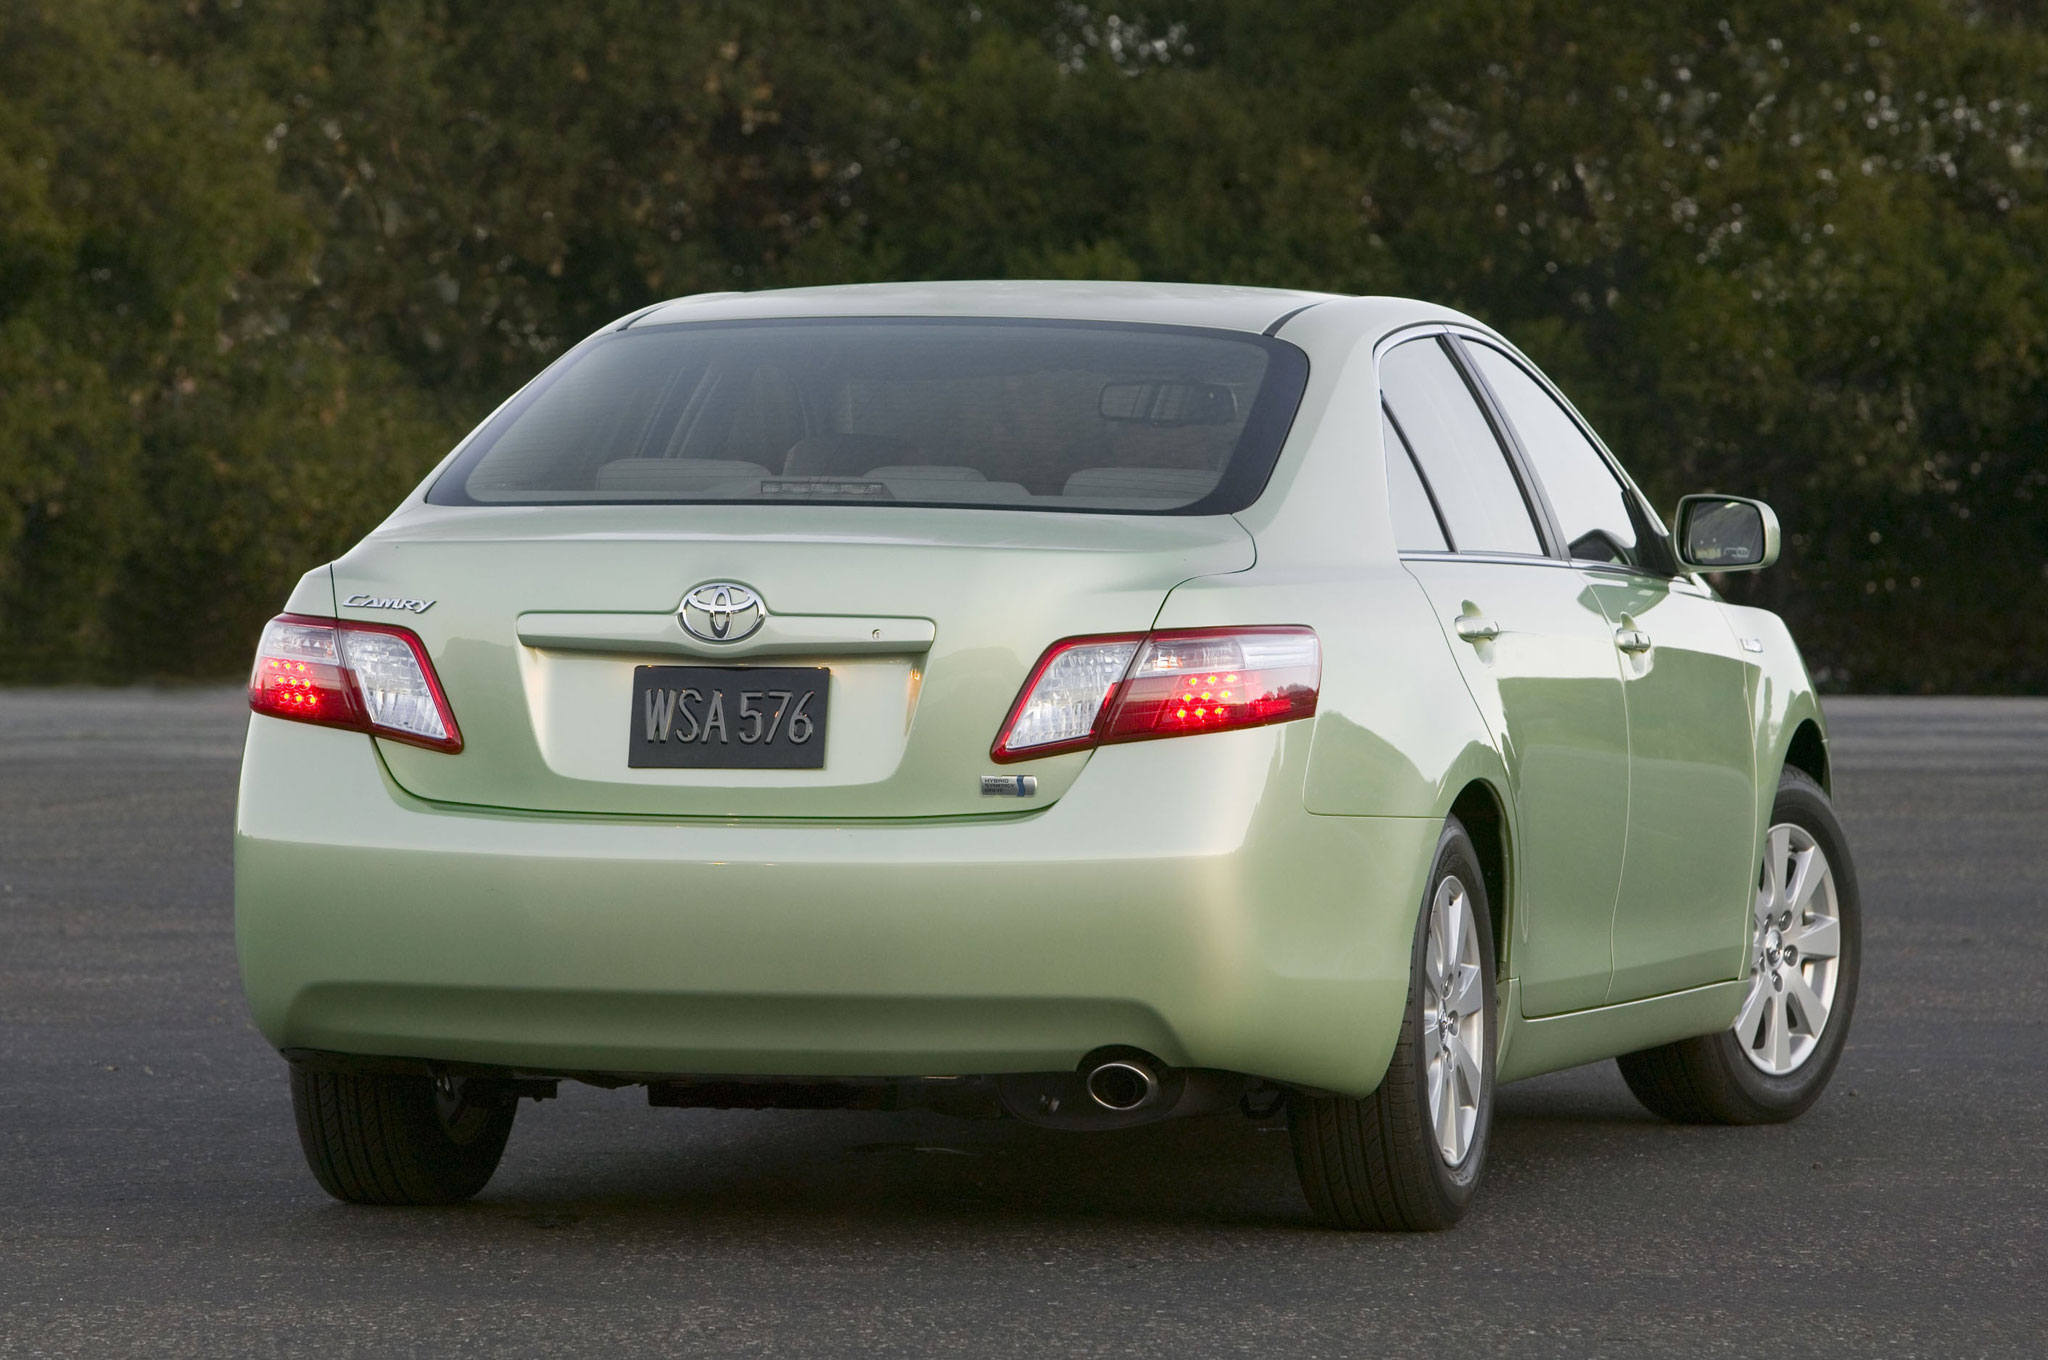 Toyota Hybrid Batteries To Power Yellowstone Park Automobile